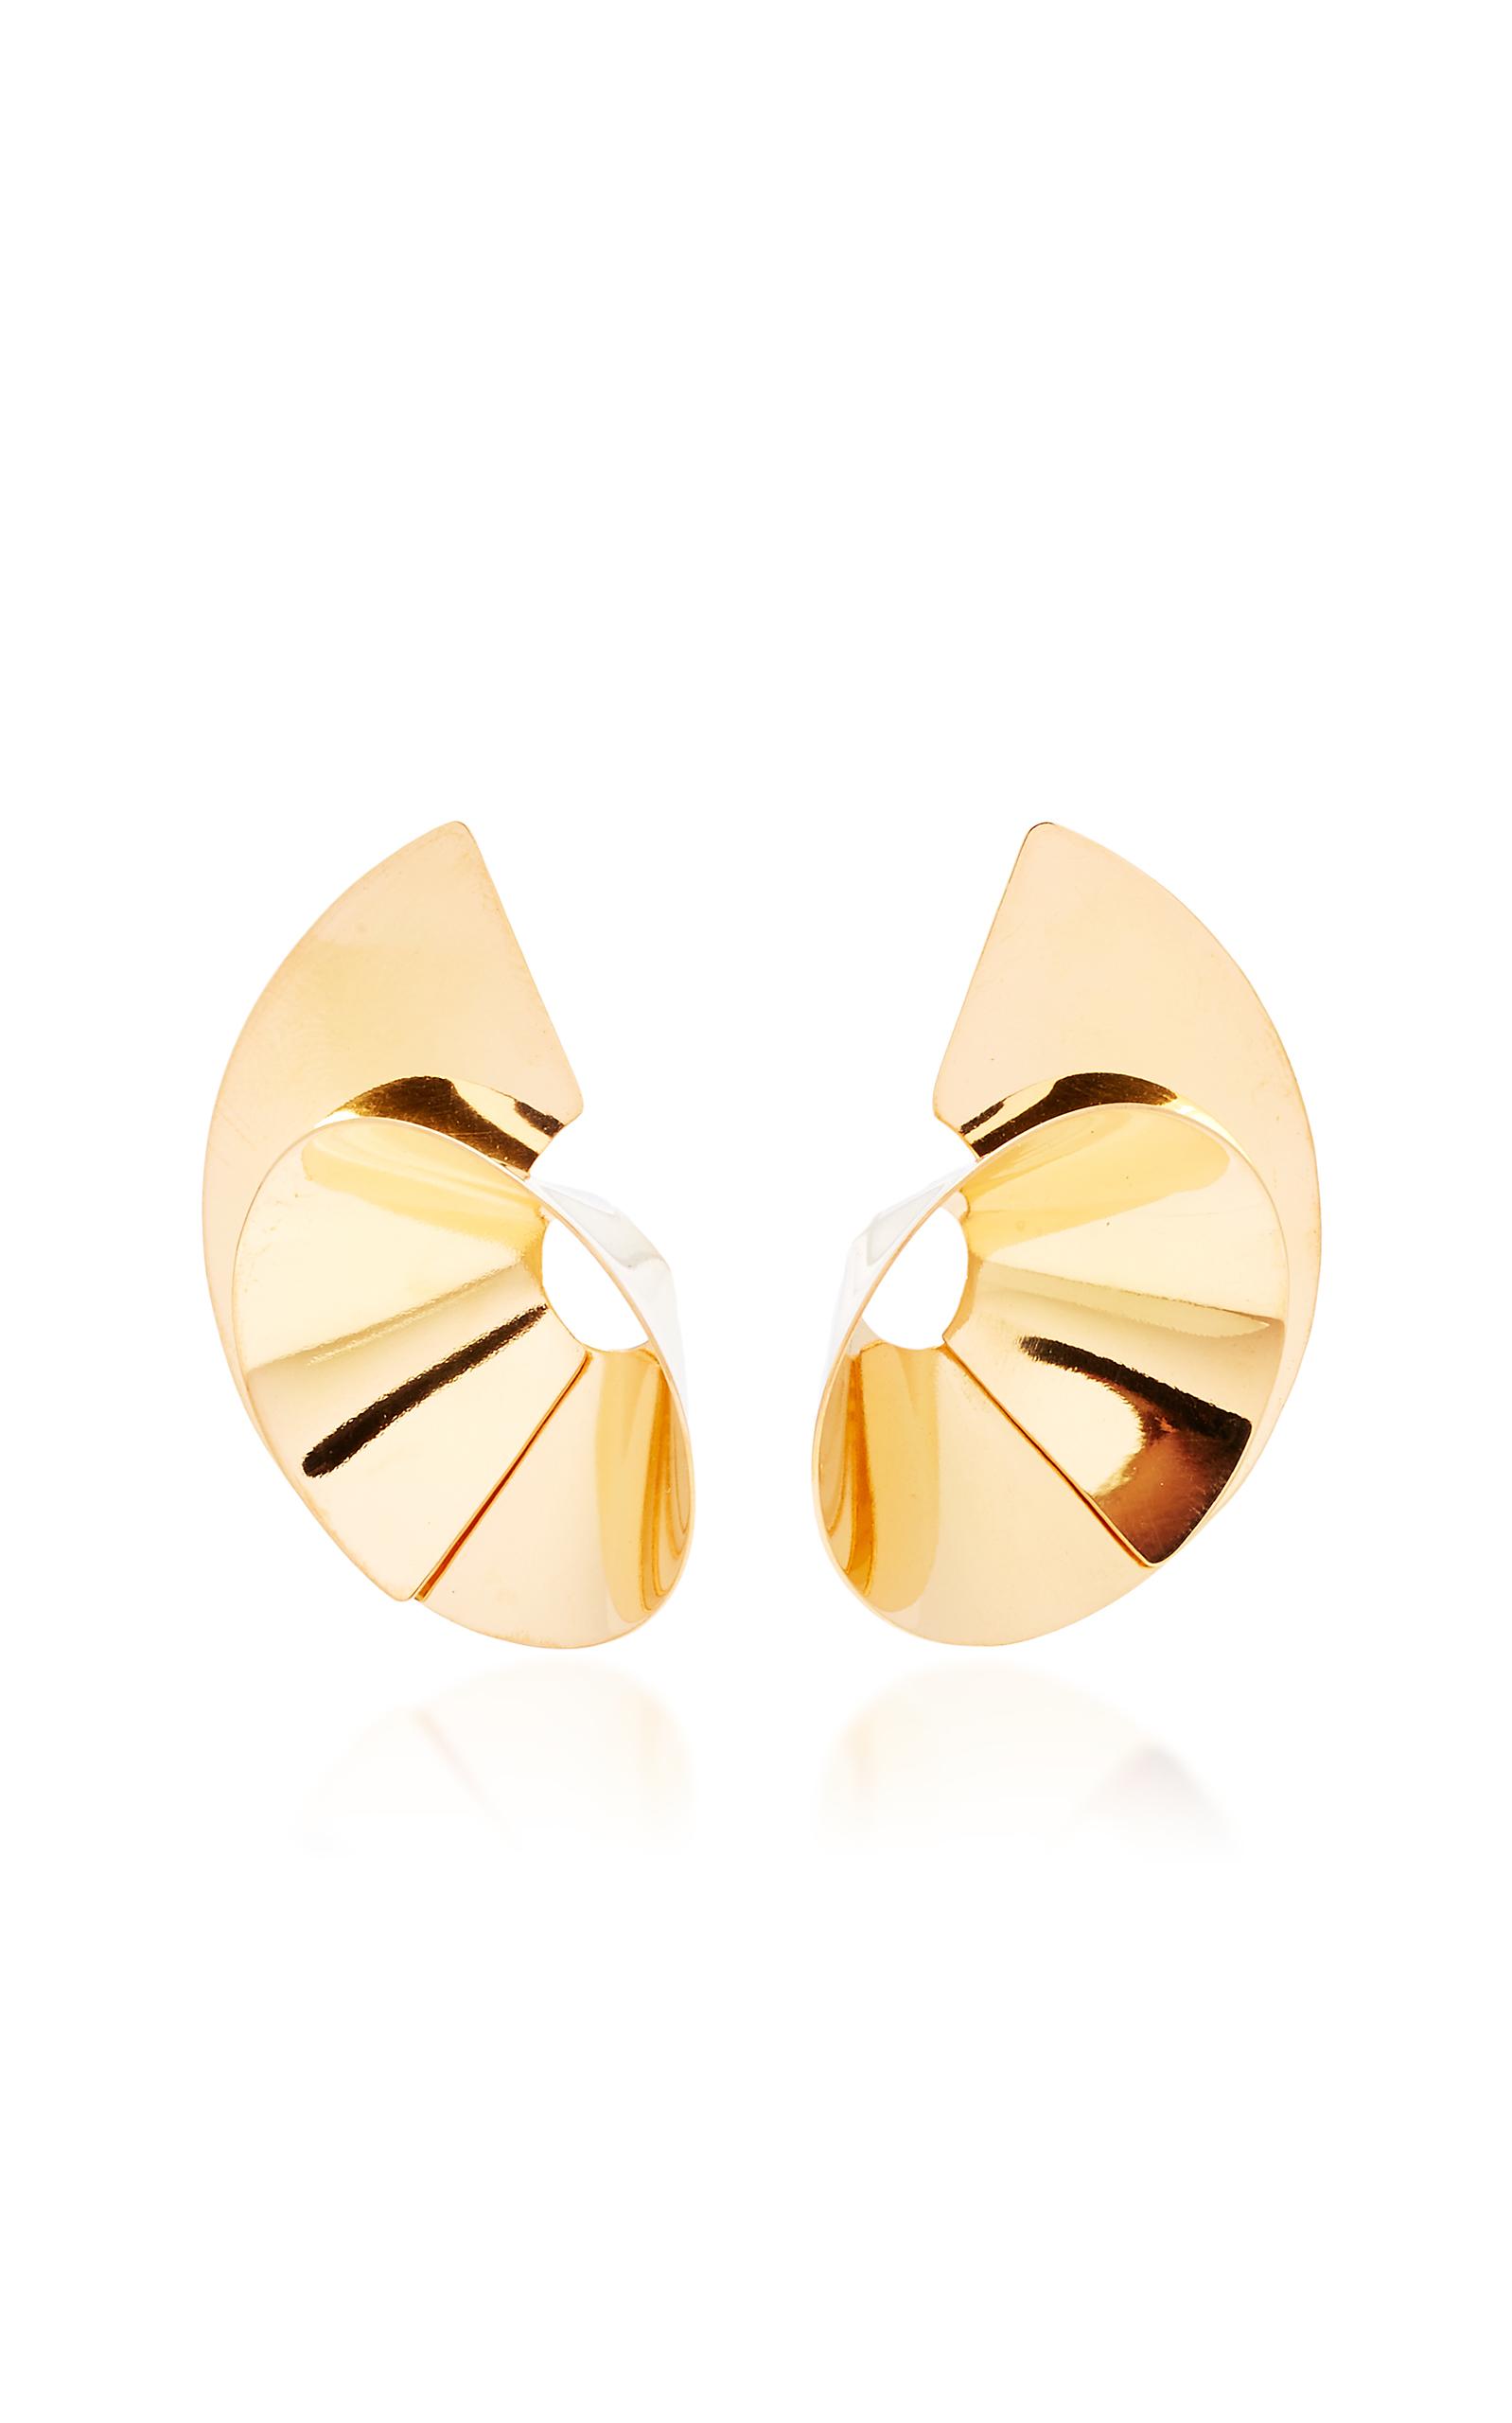 BIA DAIDONE MAX 24K GOLD-PLATED EARRINGS